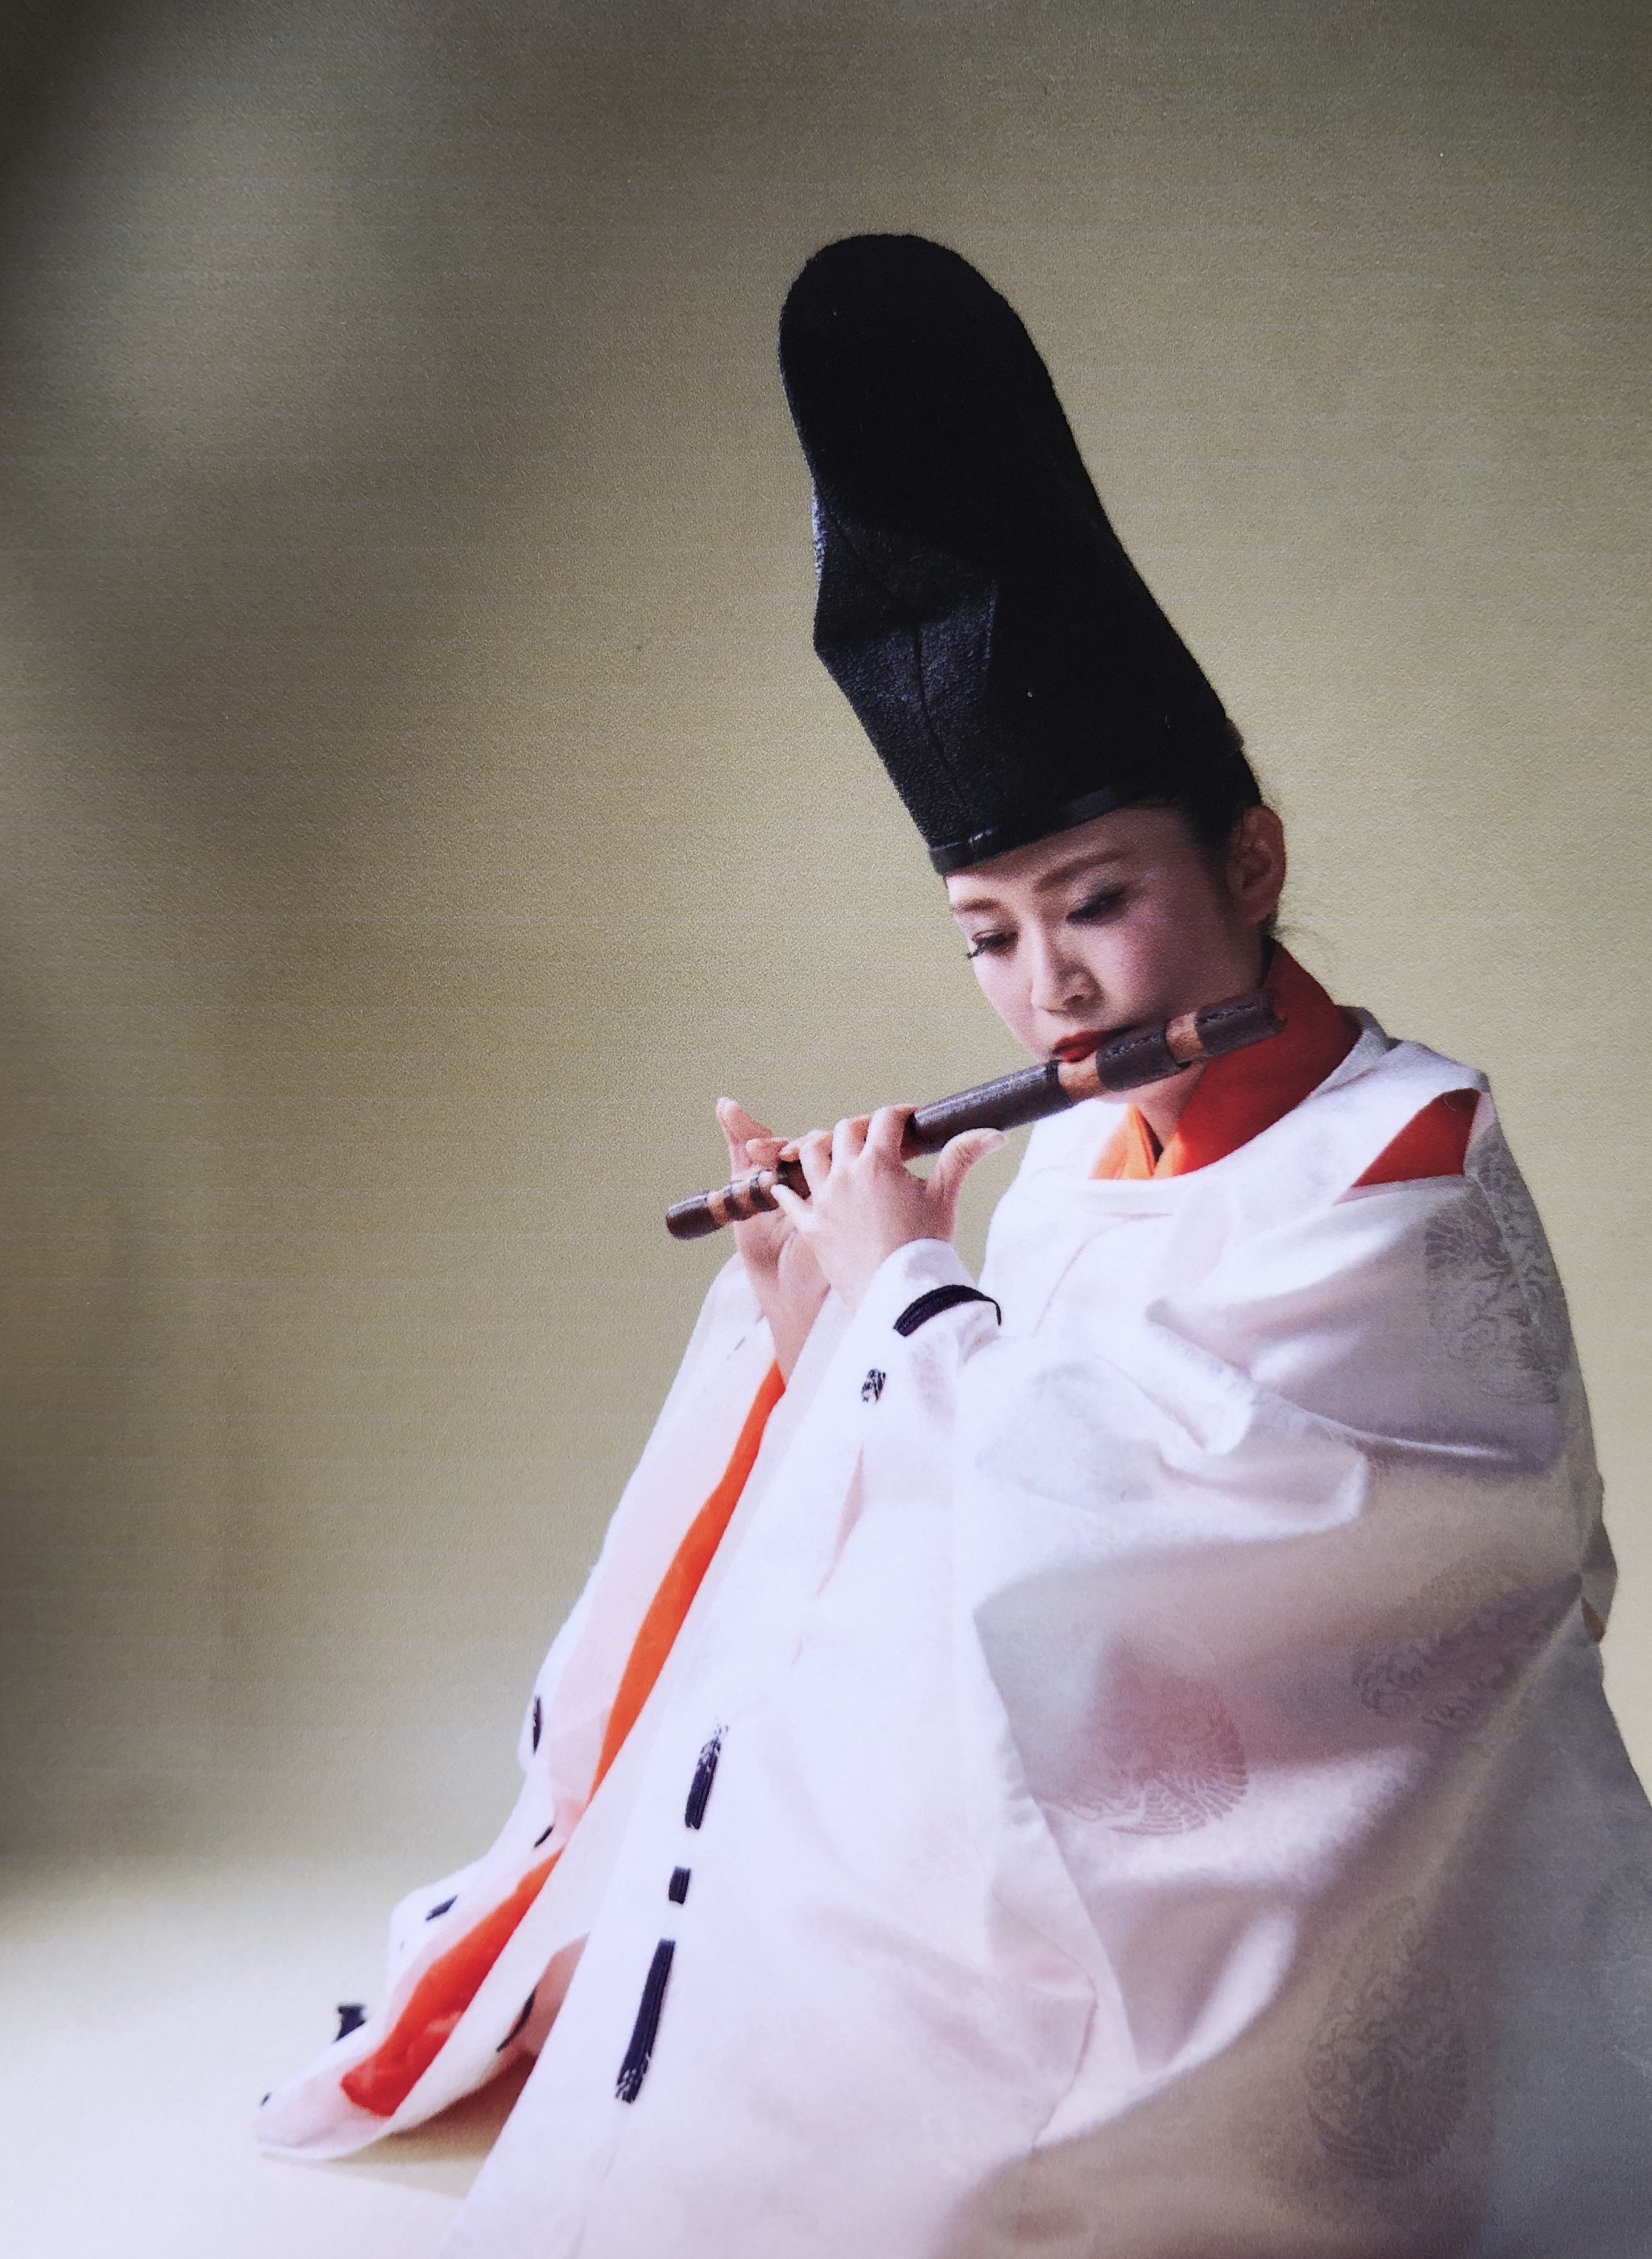 清田 裕美子 Yumiko Kiyota(龍笛)